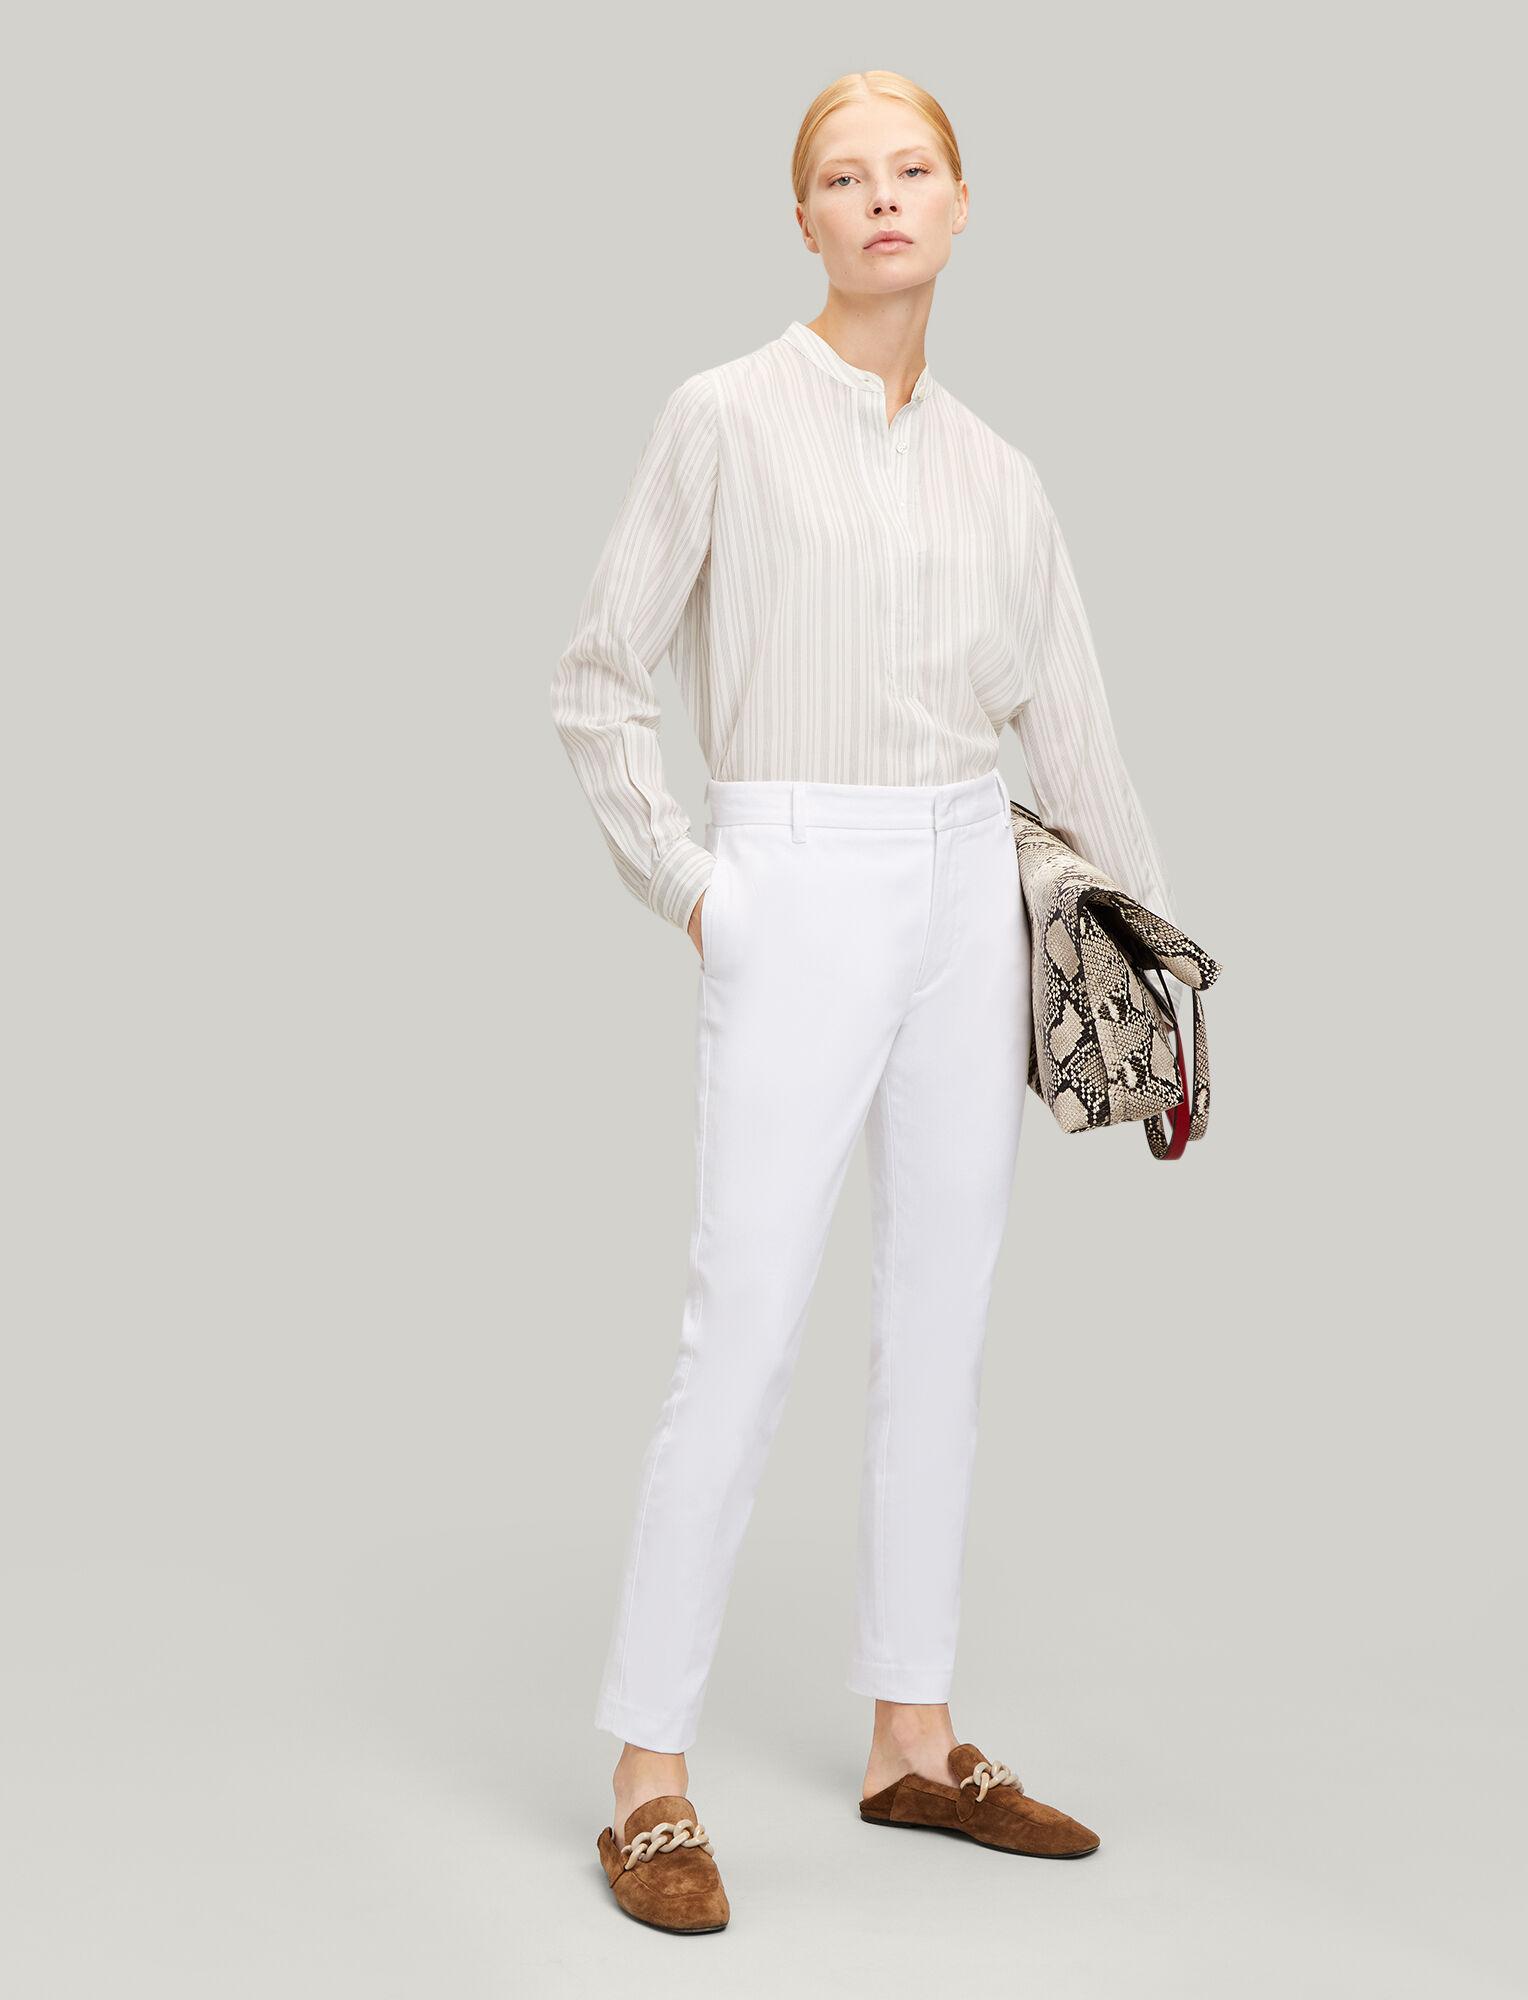 Joseph, Zoom Drill Stretch Trousers, in WHITE